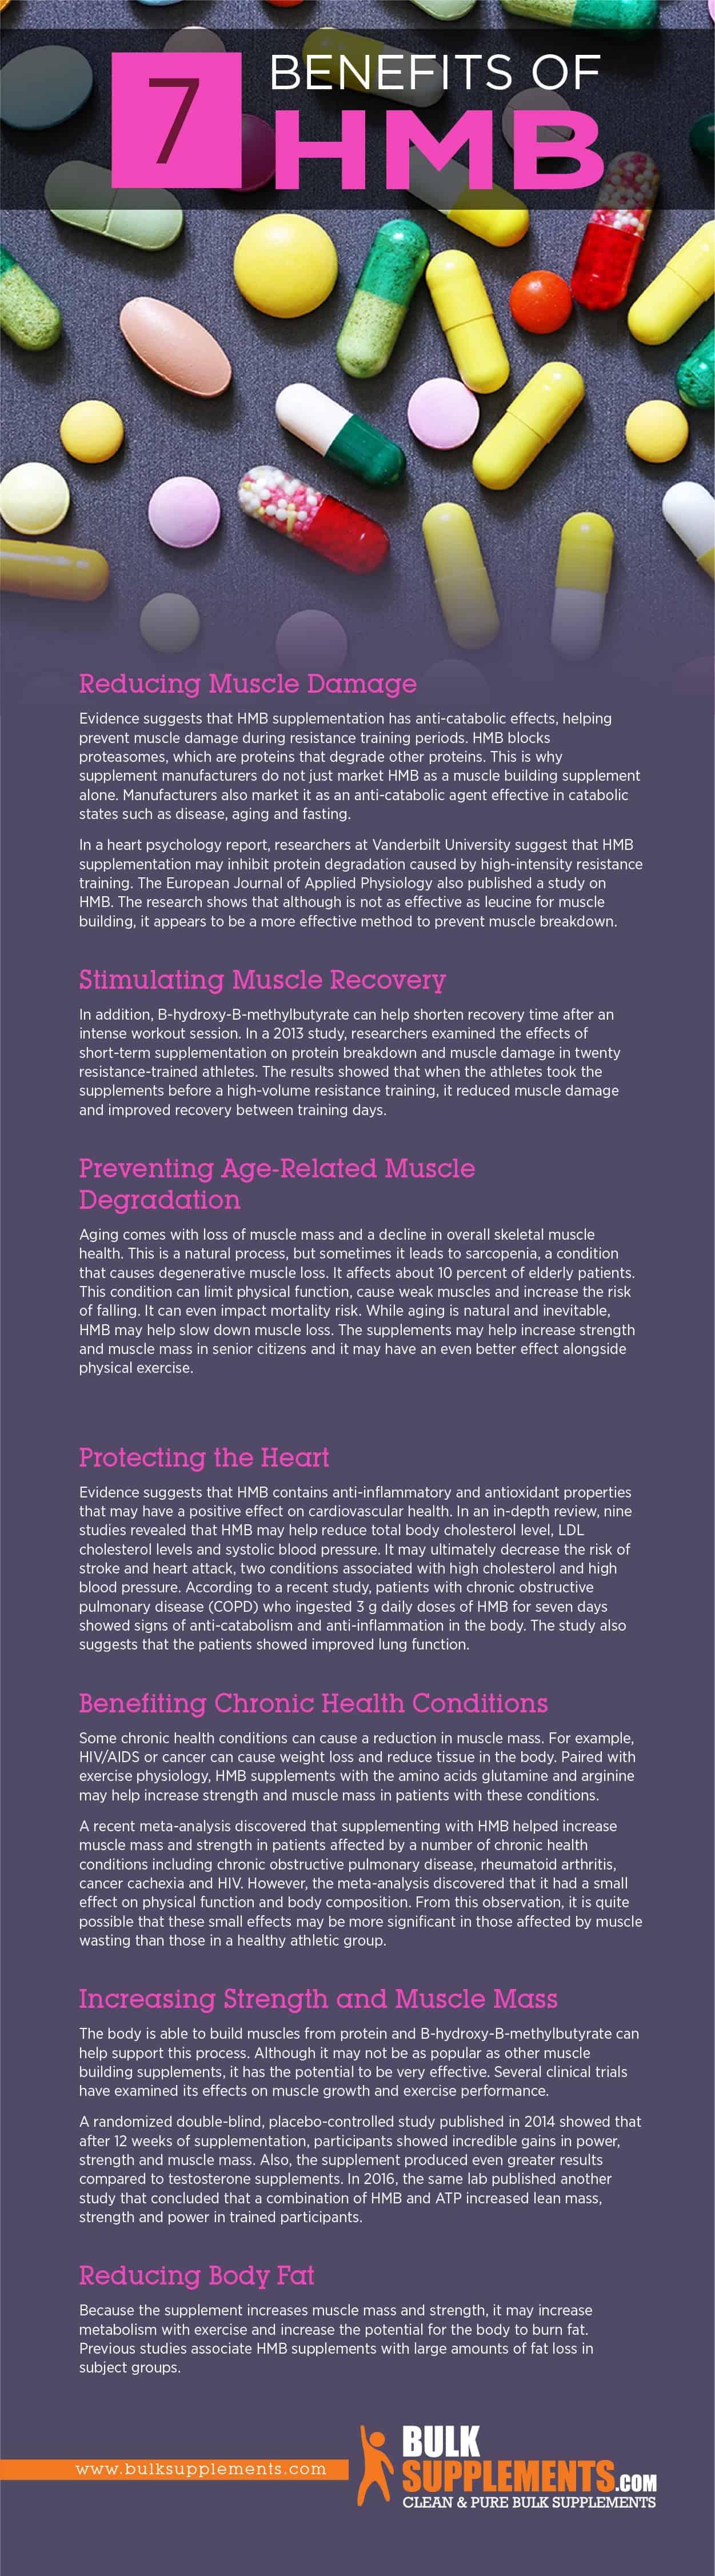 Benefits of HMB supplements